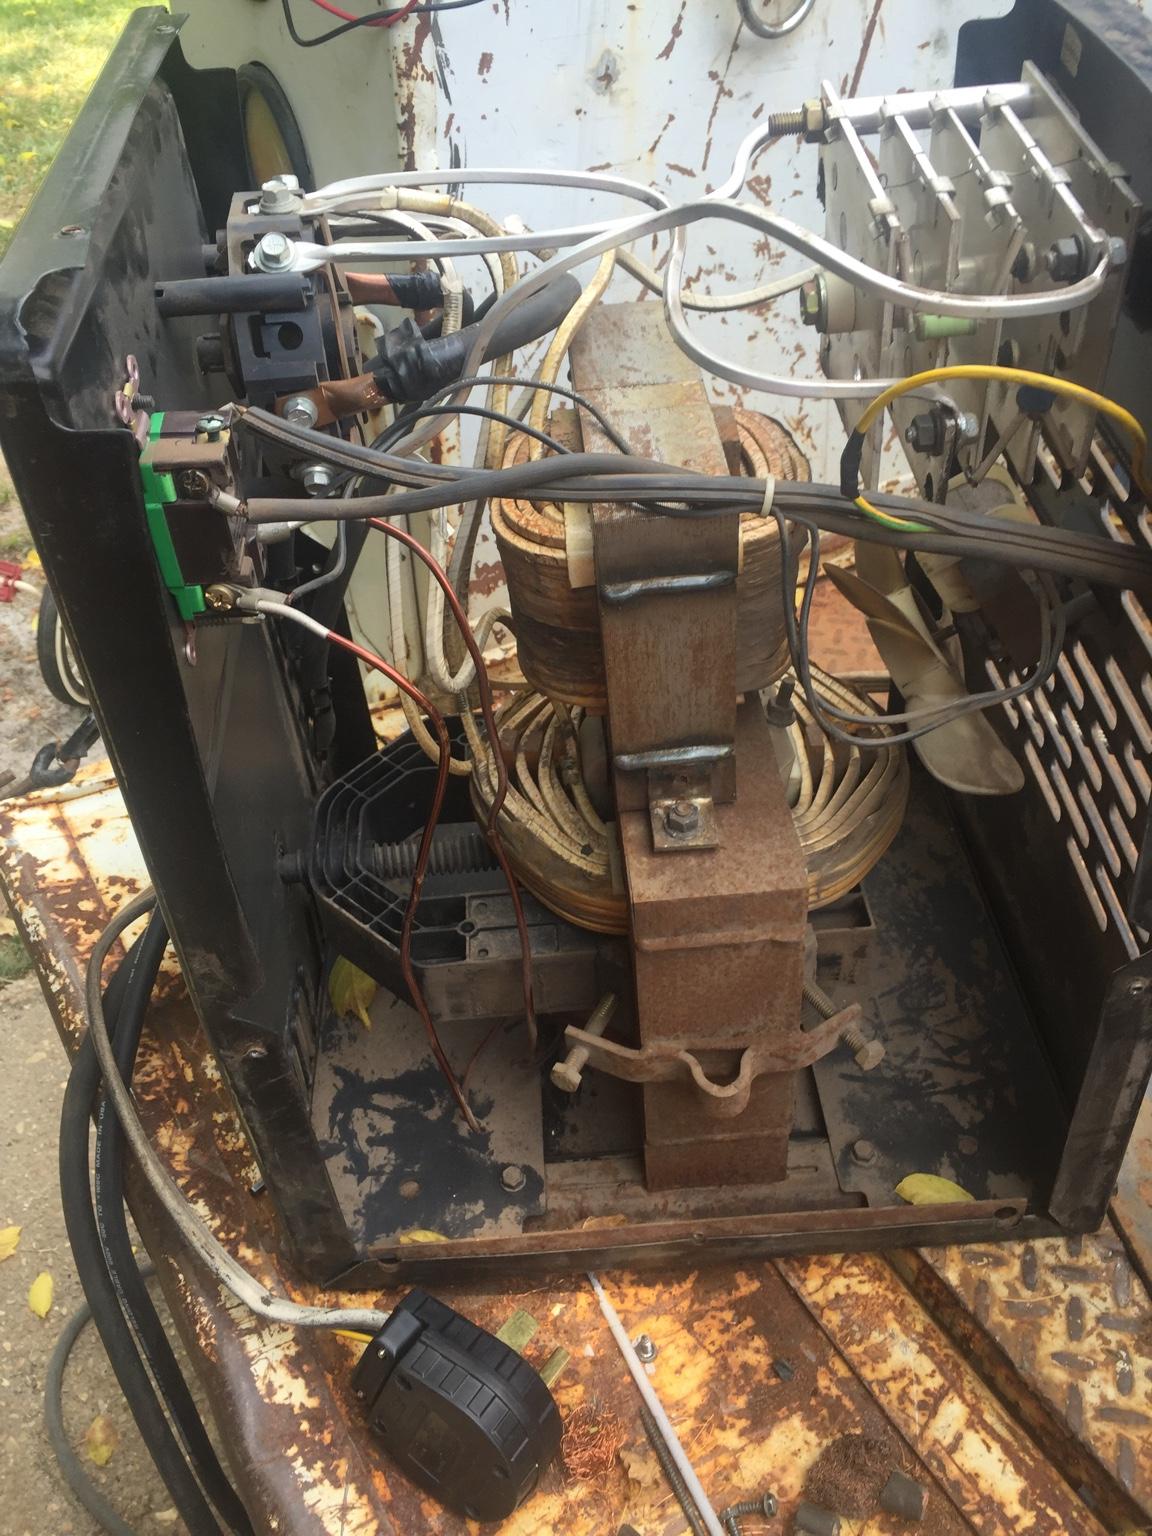 220 plug wiring diagram 1998 chevy silverado miller thunderbolt 225 ac/dc help